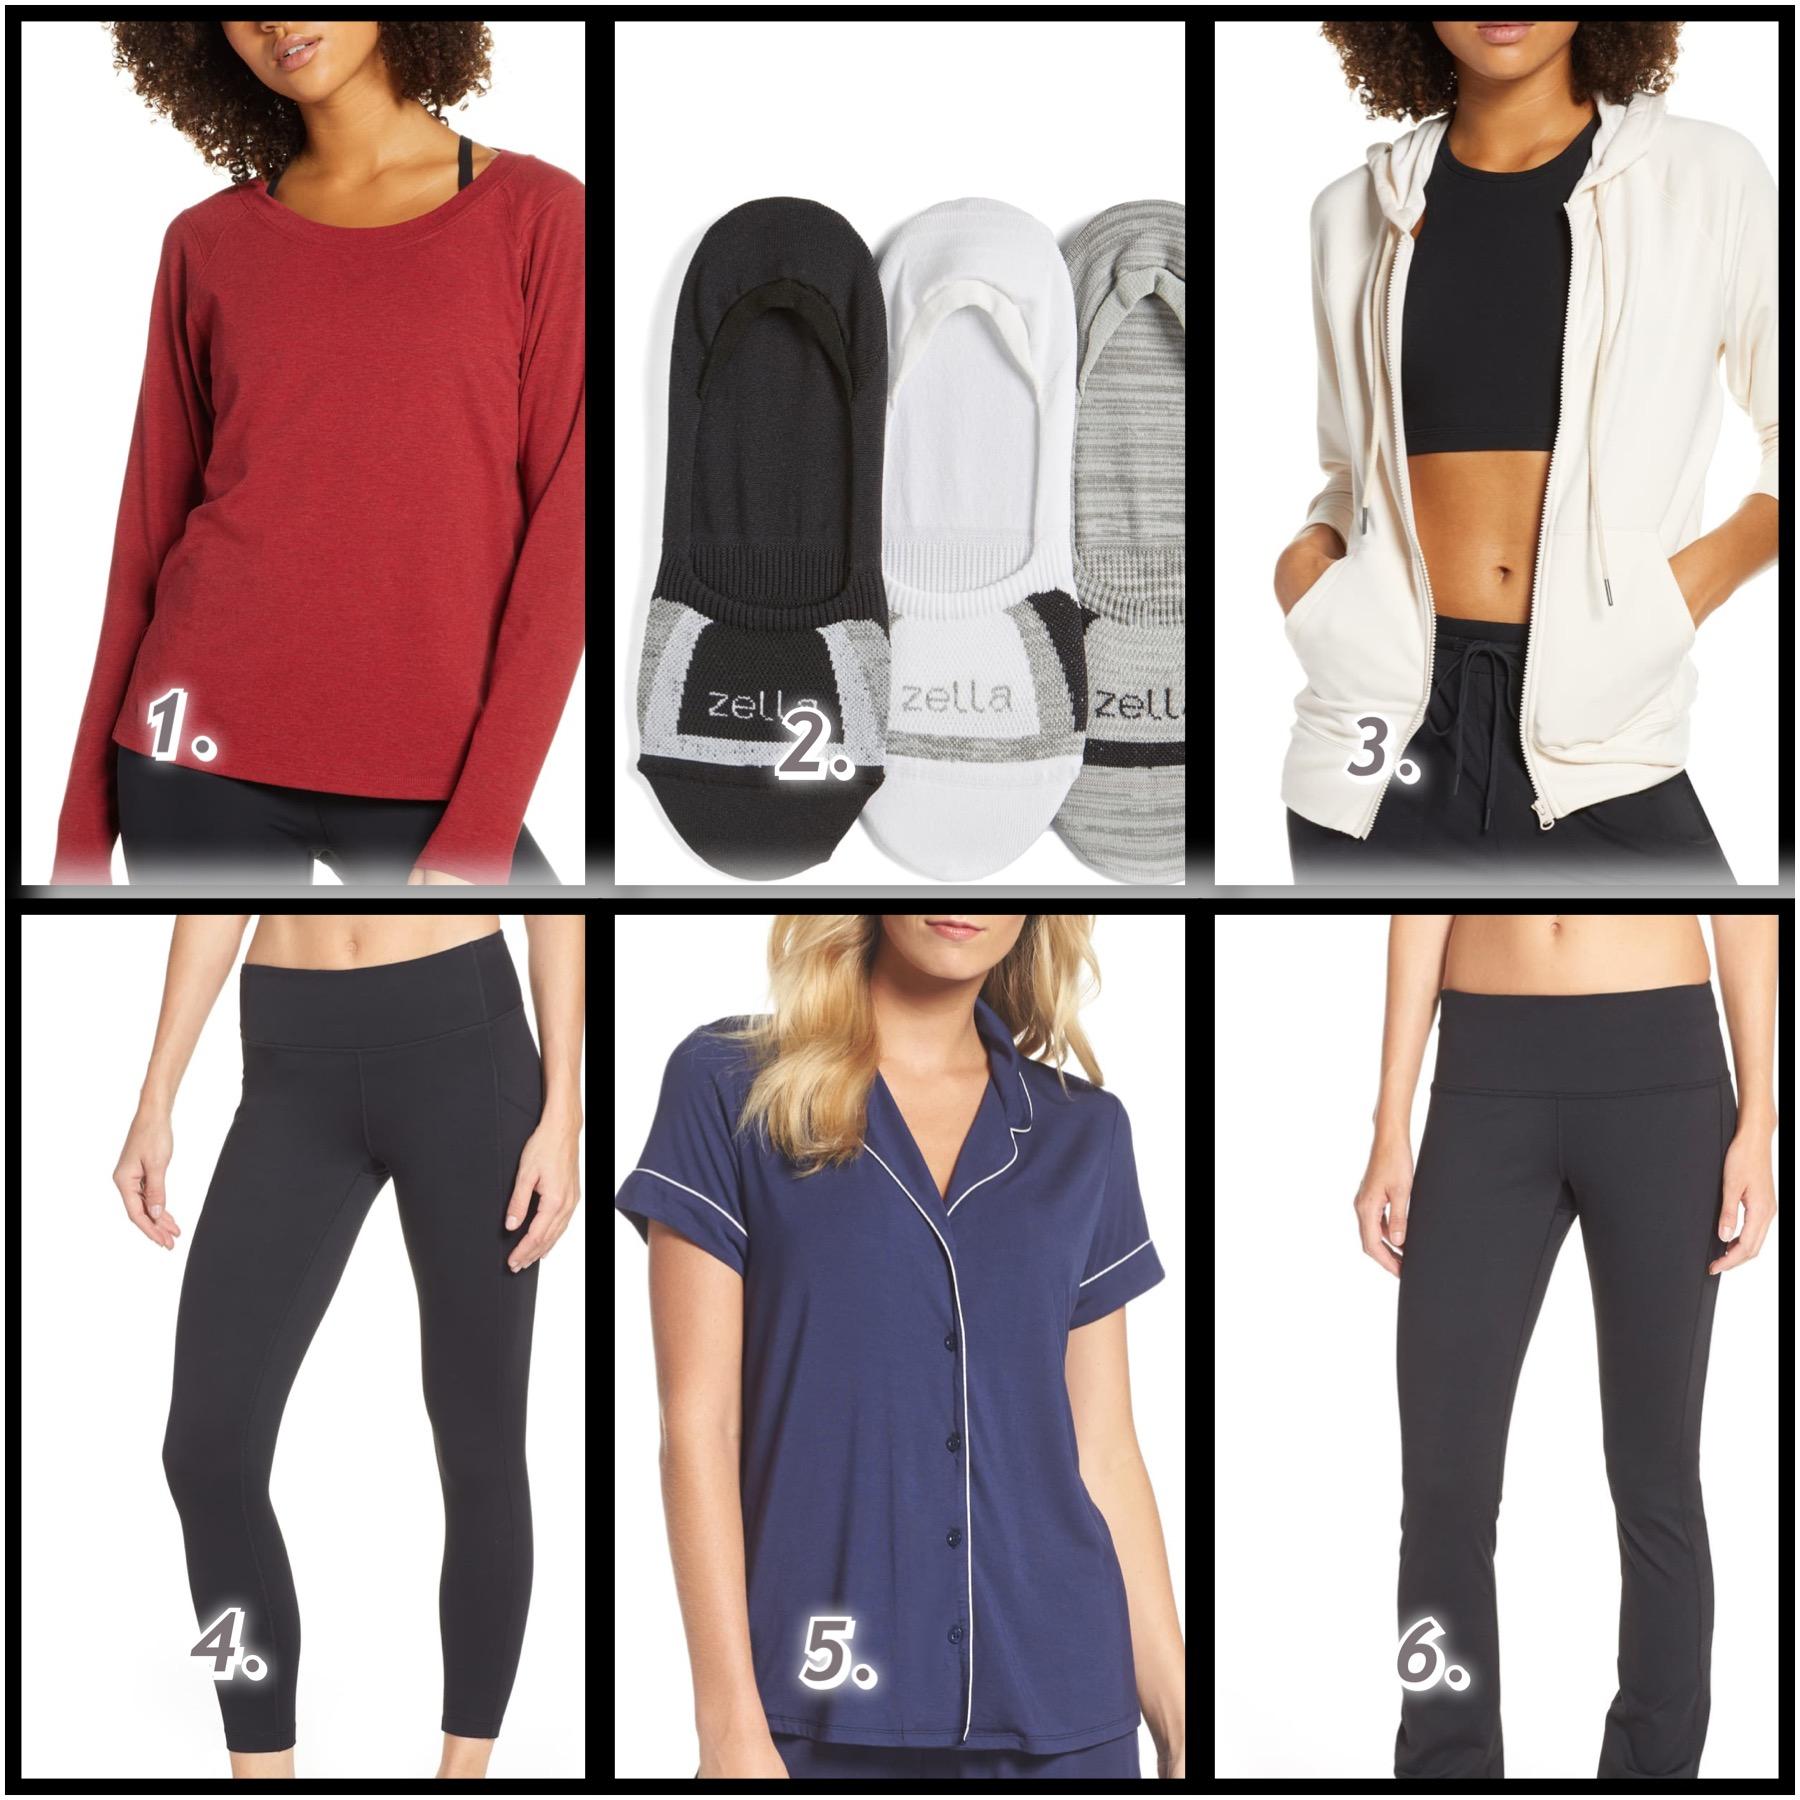 Nordstrom Anniversary Sale: Activewear, Sleepwear and Lingerie